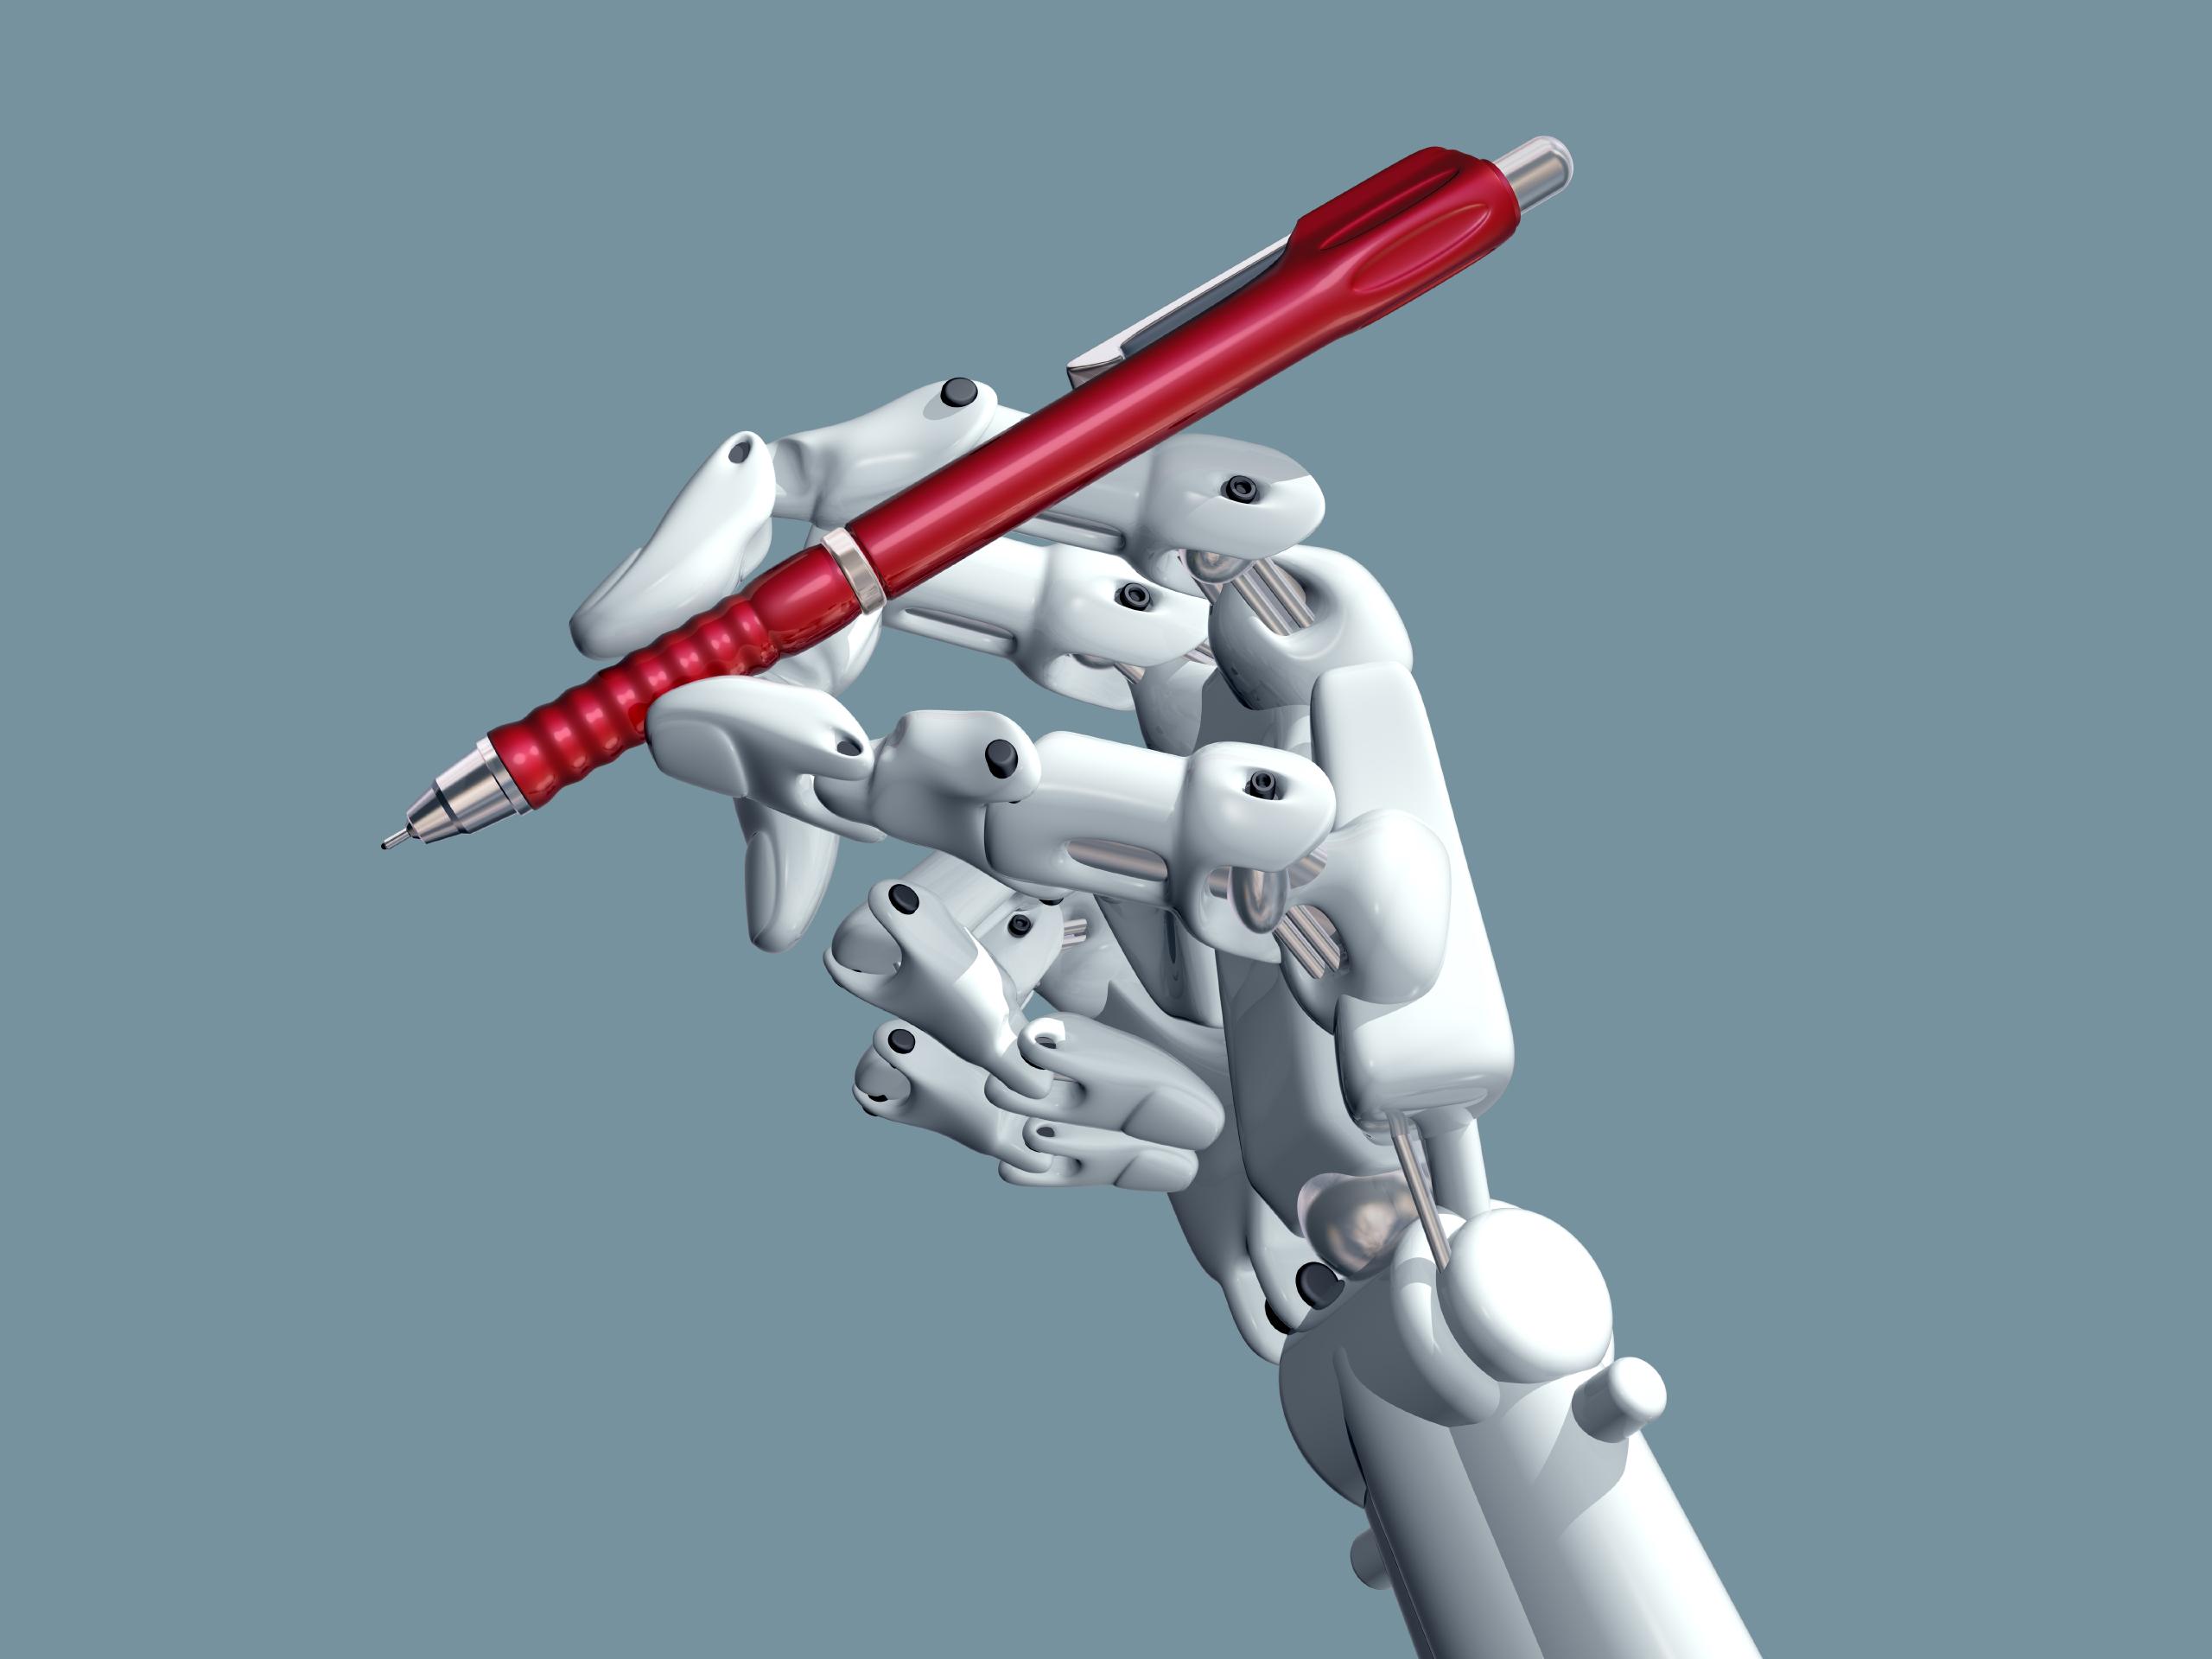 CES 2017: Robots of the future